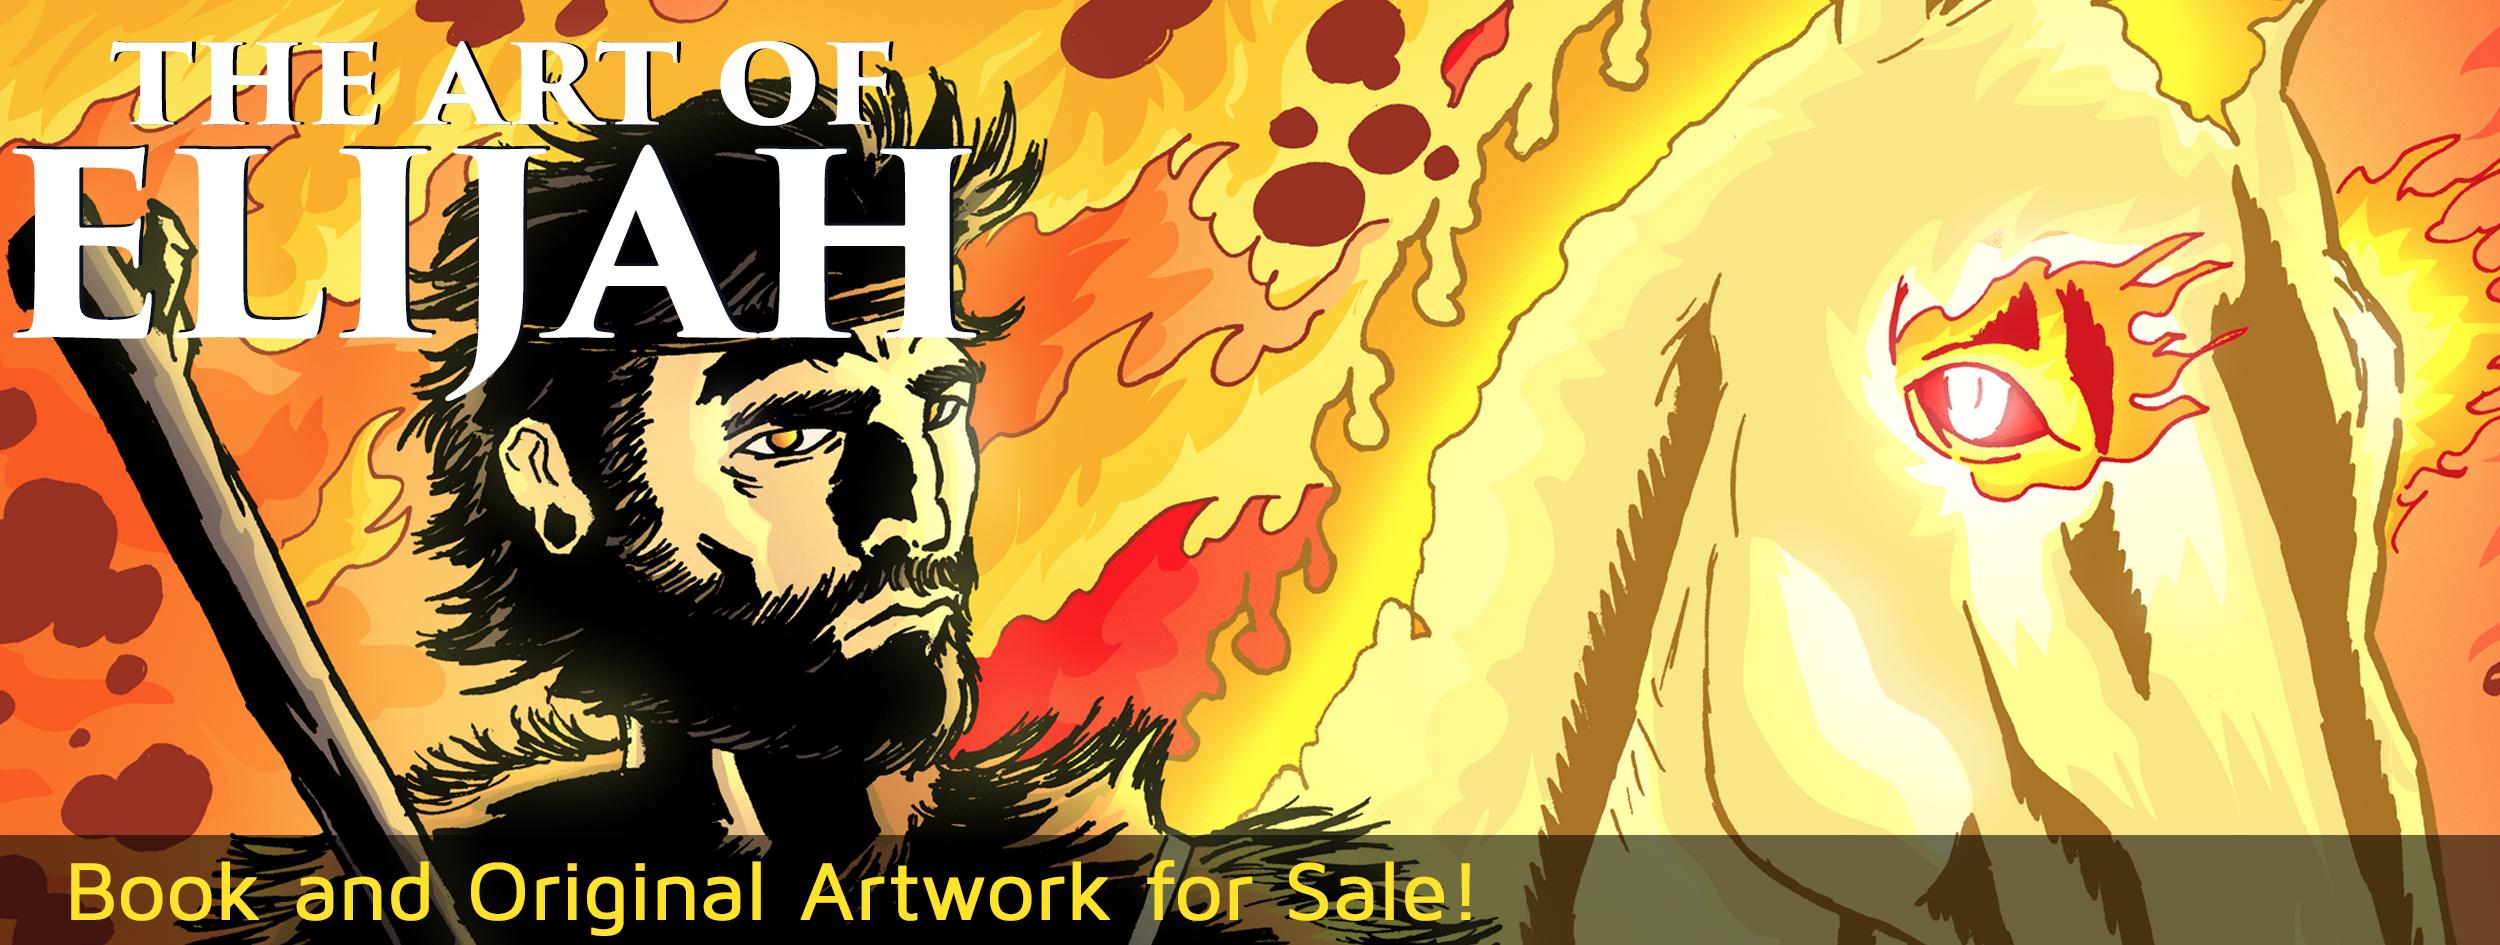 About-Elijah-Art